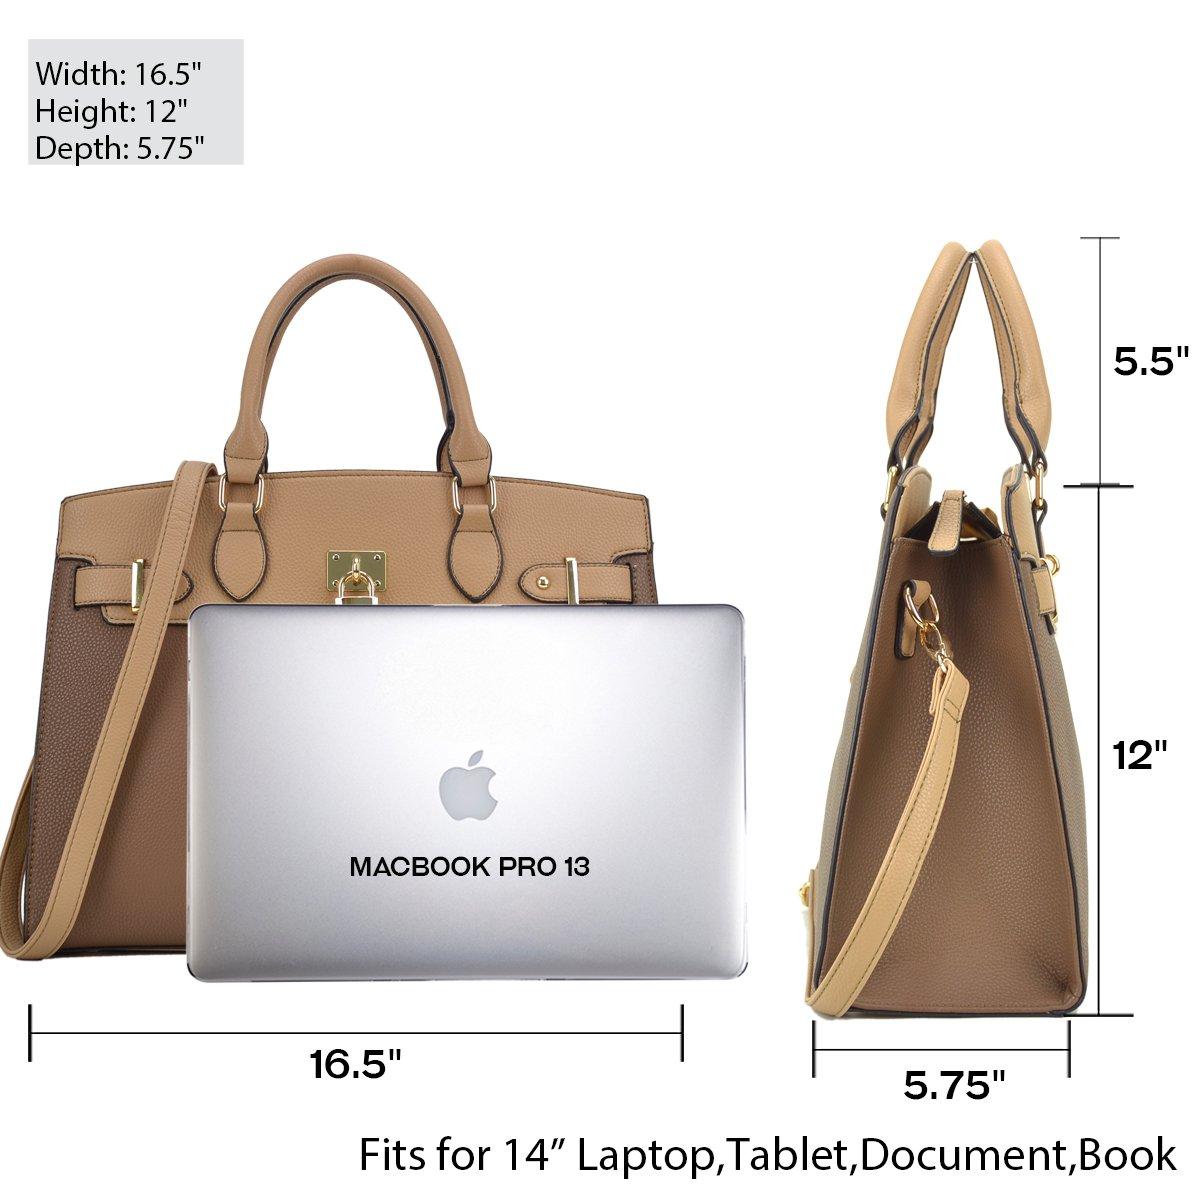 MMK collection Fashion Women Purses and Handbags Ladies Designer Satchel Handbag Tote Bag Shoulder Bags with coin purse (Z-6876-PK)